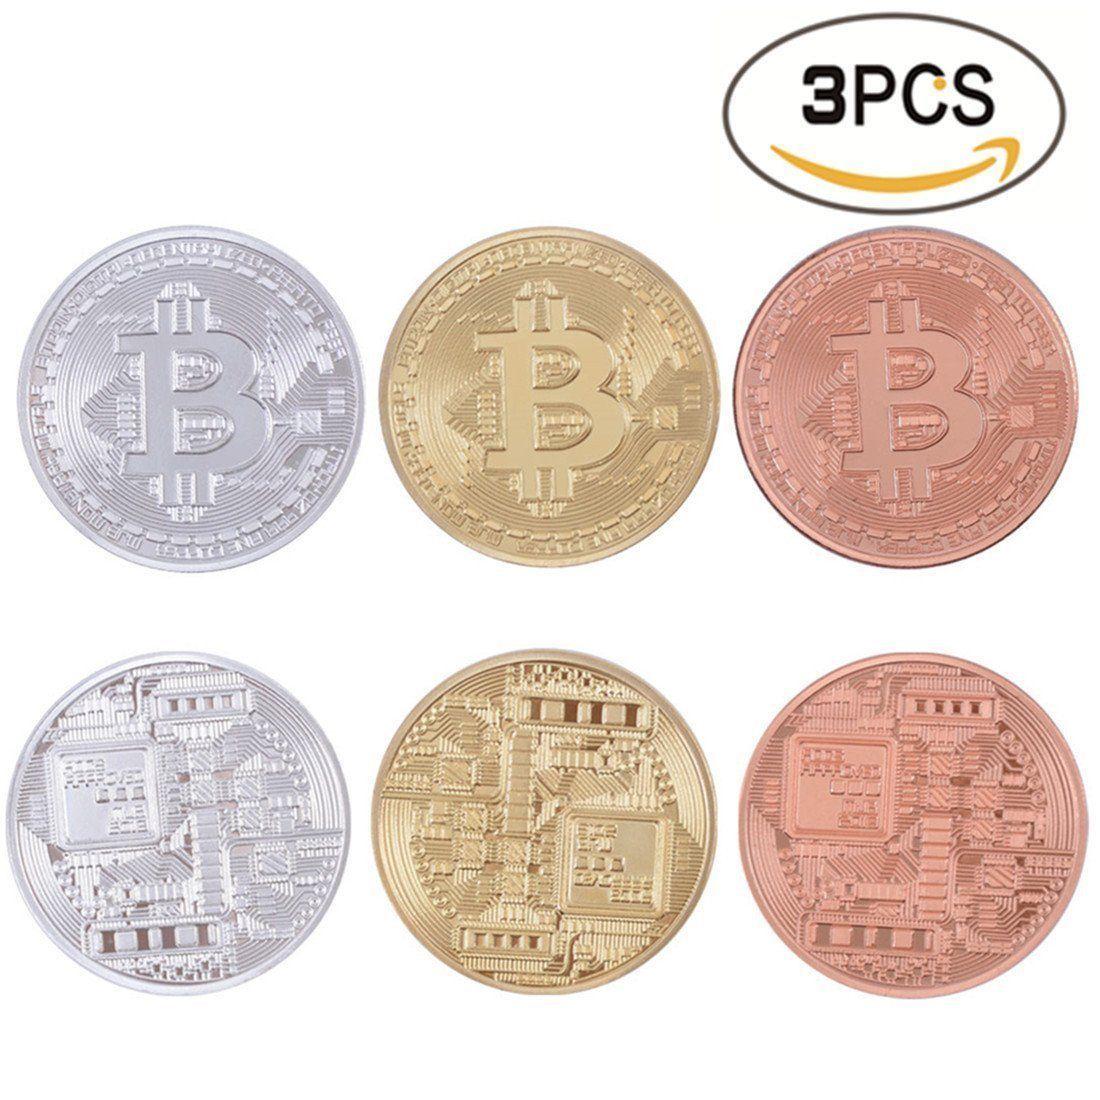 Commemorative Collectible Bitcoin Set - 3 Pieces Total w/Random Color and Design